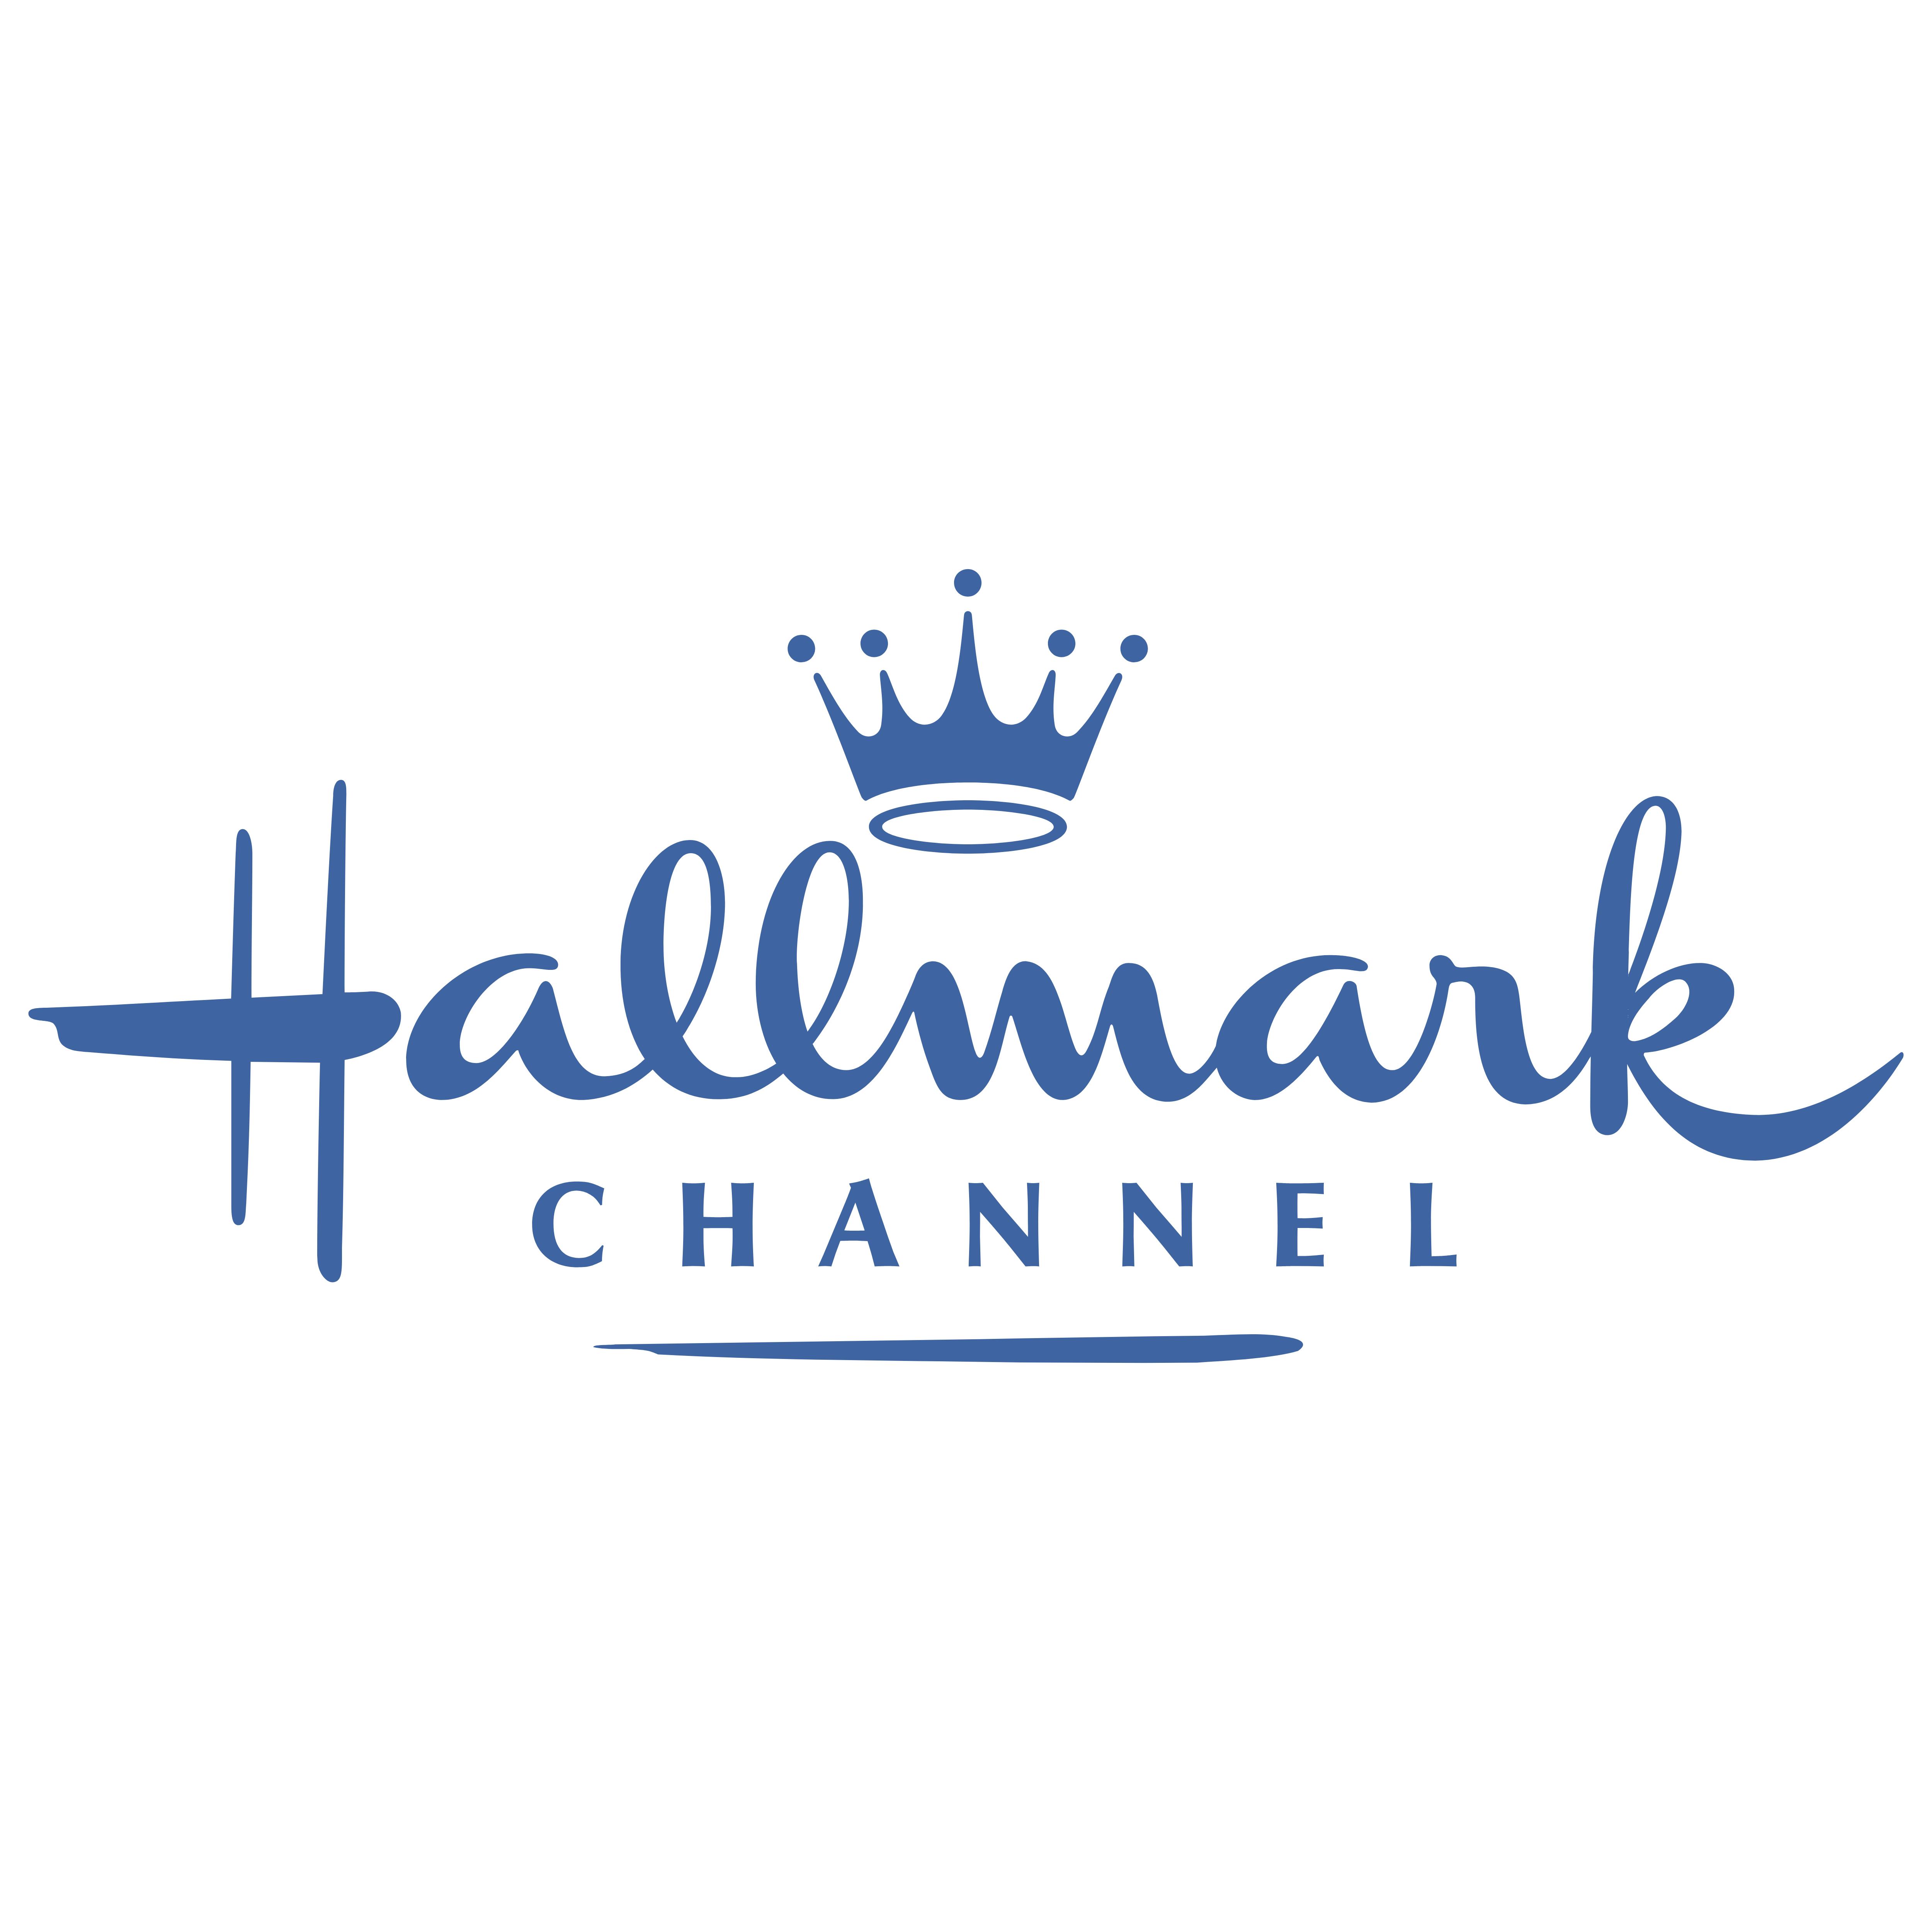 Hallmark channel logo clipart picture free download Hallmark Channel – Logos Download picture free download